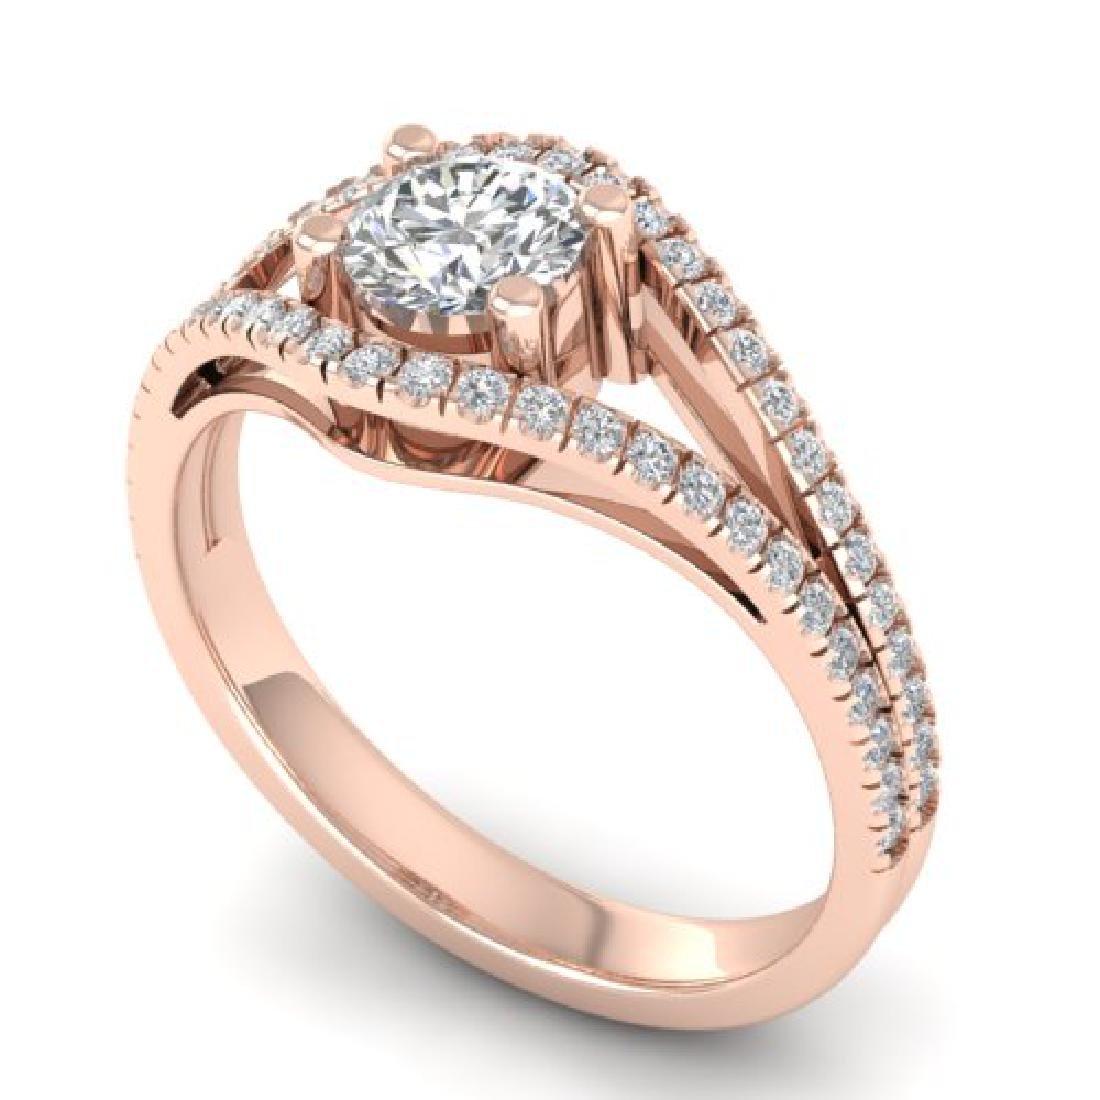 1.05 CTW Certified VS/SI Diamond Art Deco Ring 18K Rose - 2